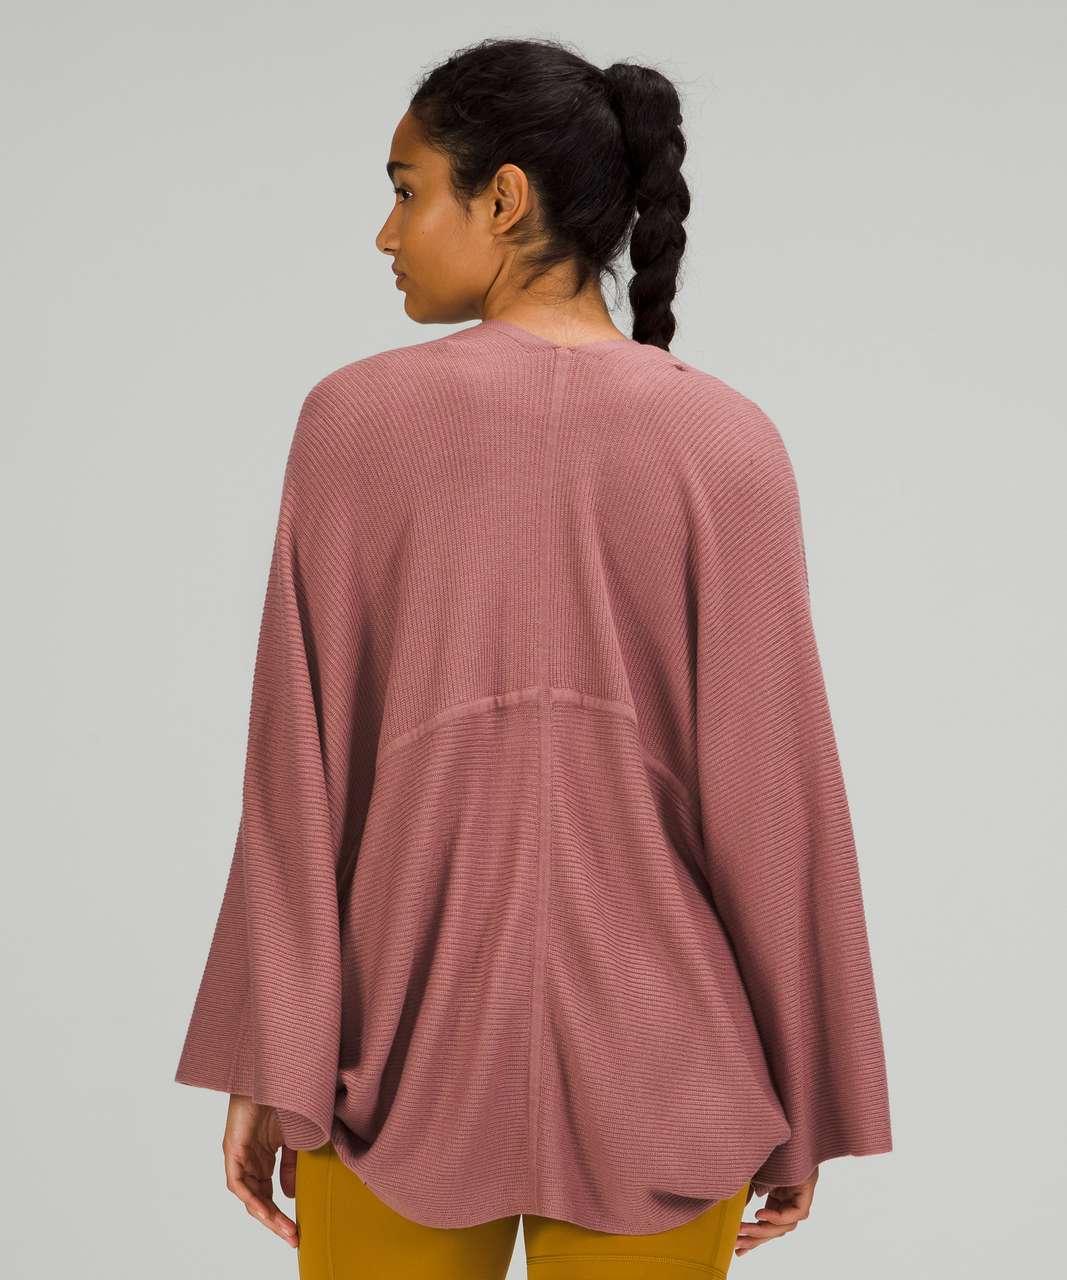 Lululemon Cashlu Knit Textured Wrap - Spiced Chai